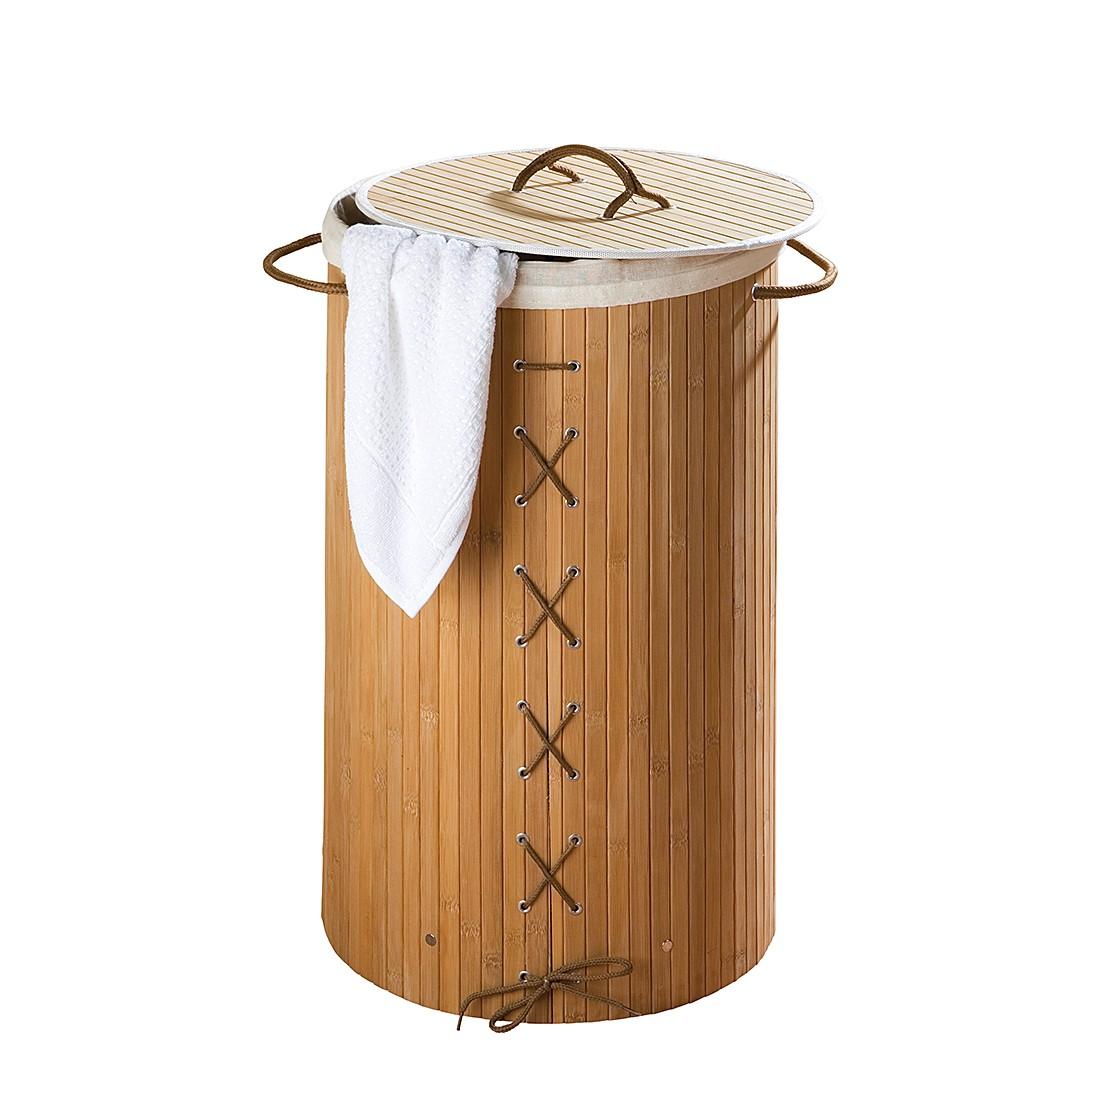 Wäschetruhe Bamboo – Natur, WENKO online bestellen